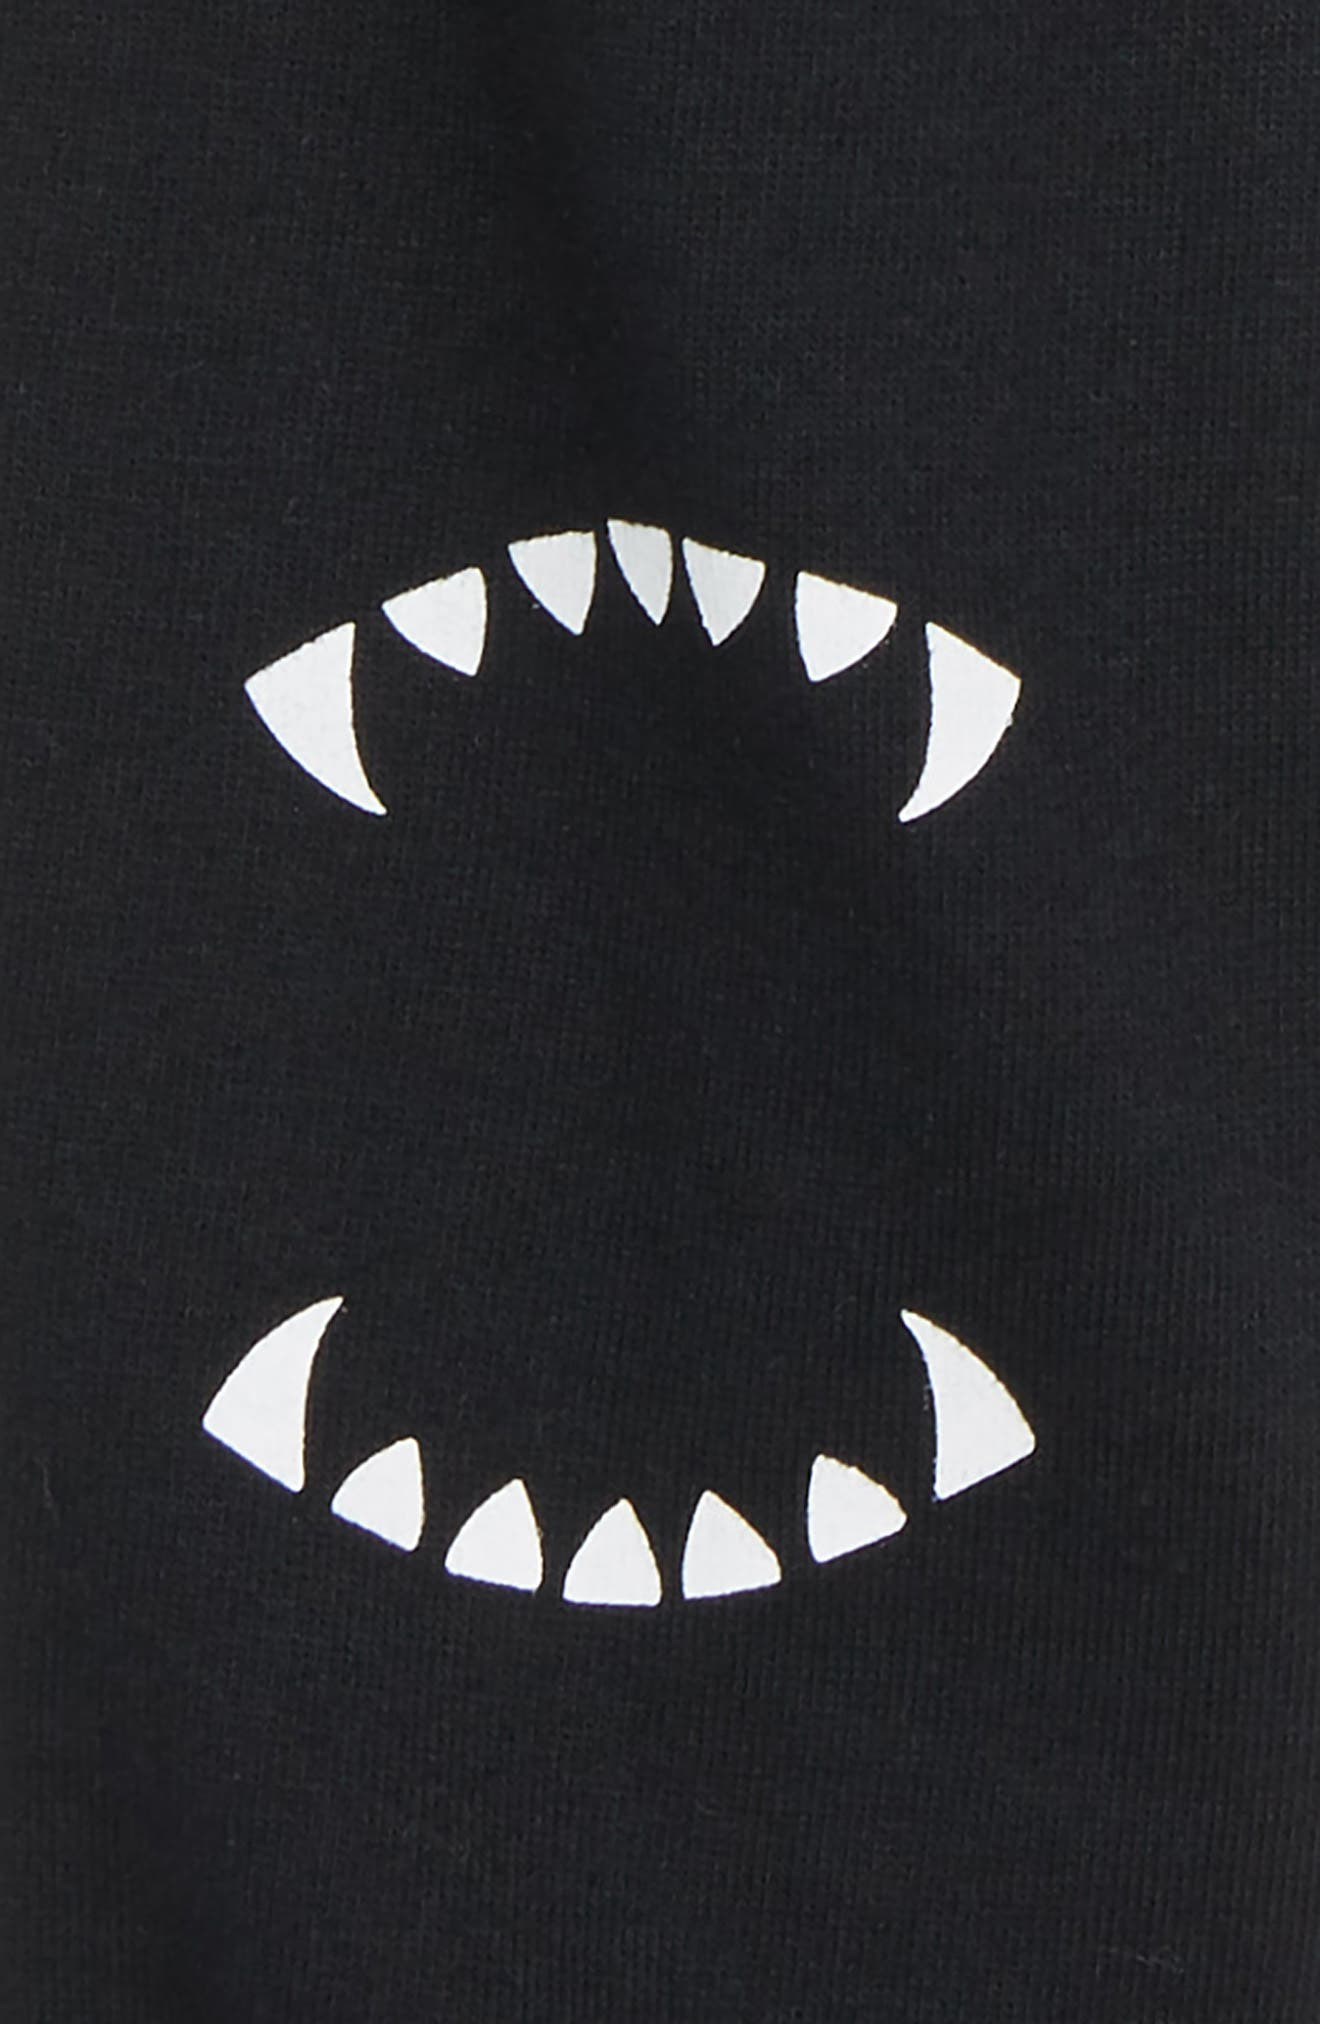 Teeth Graphic Cotton Jogger Pants,                             Alternate thumbnail 3, color,                             001